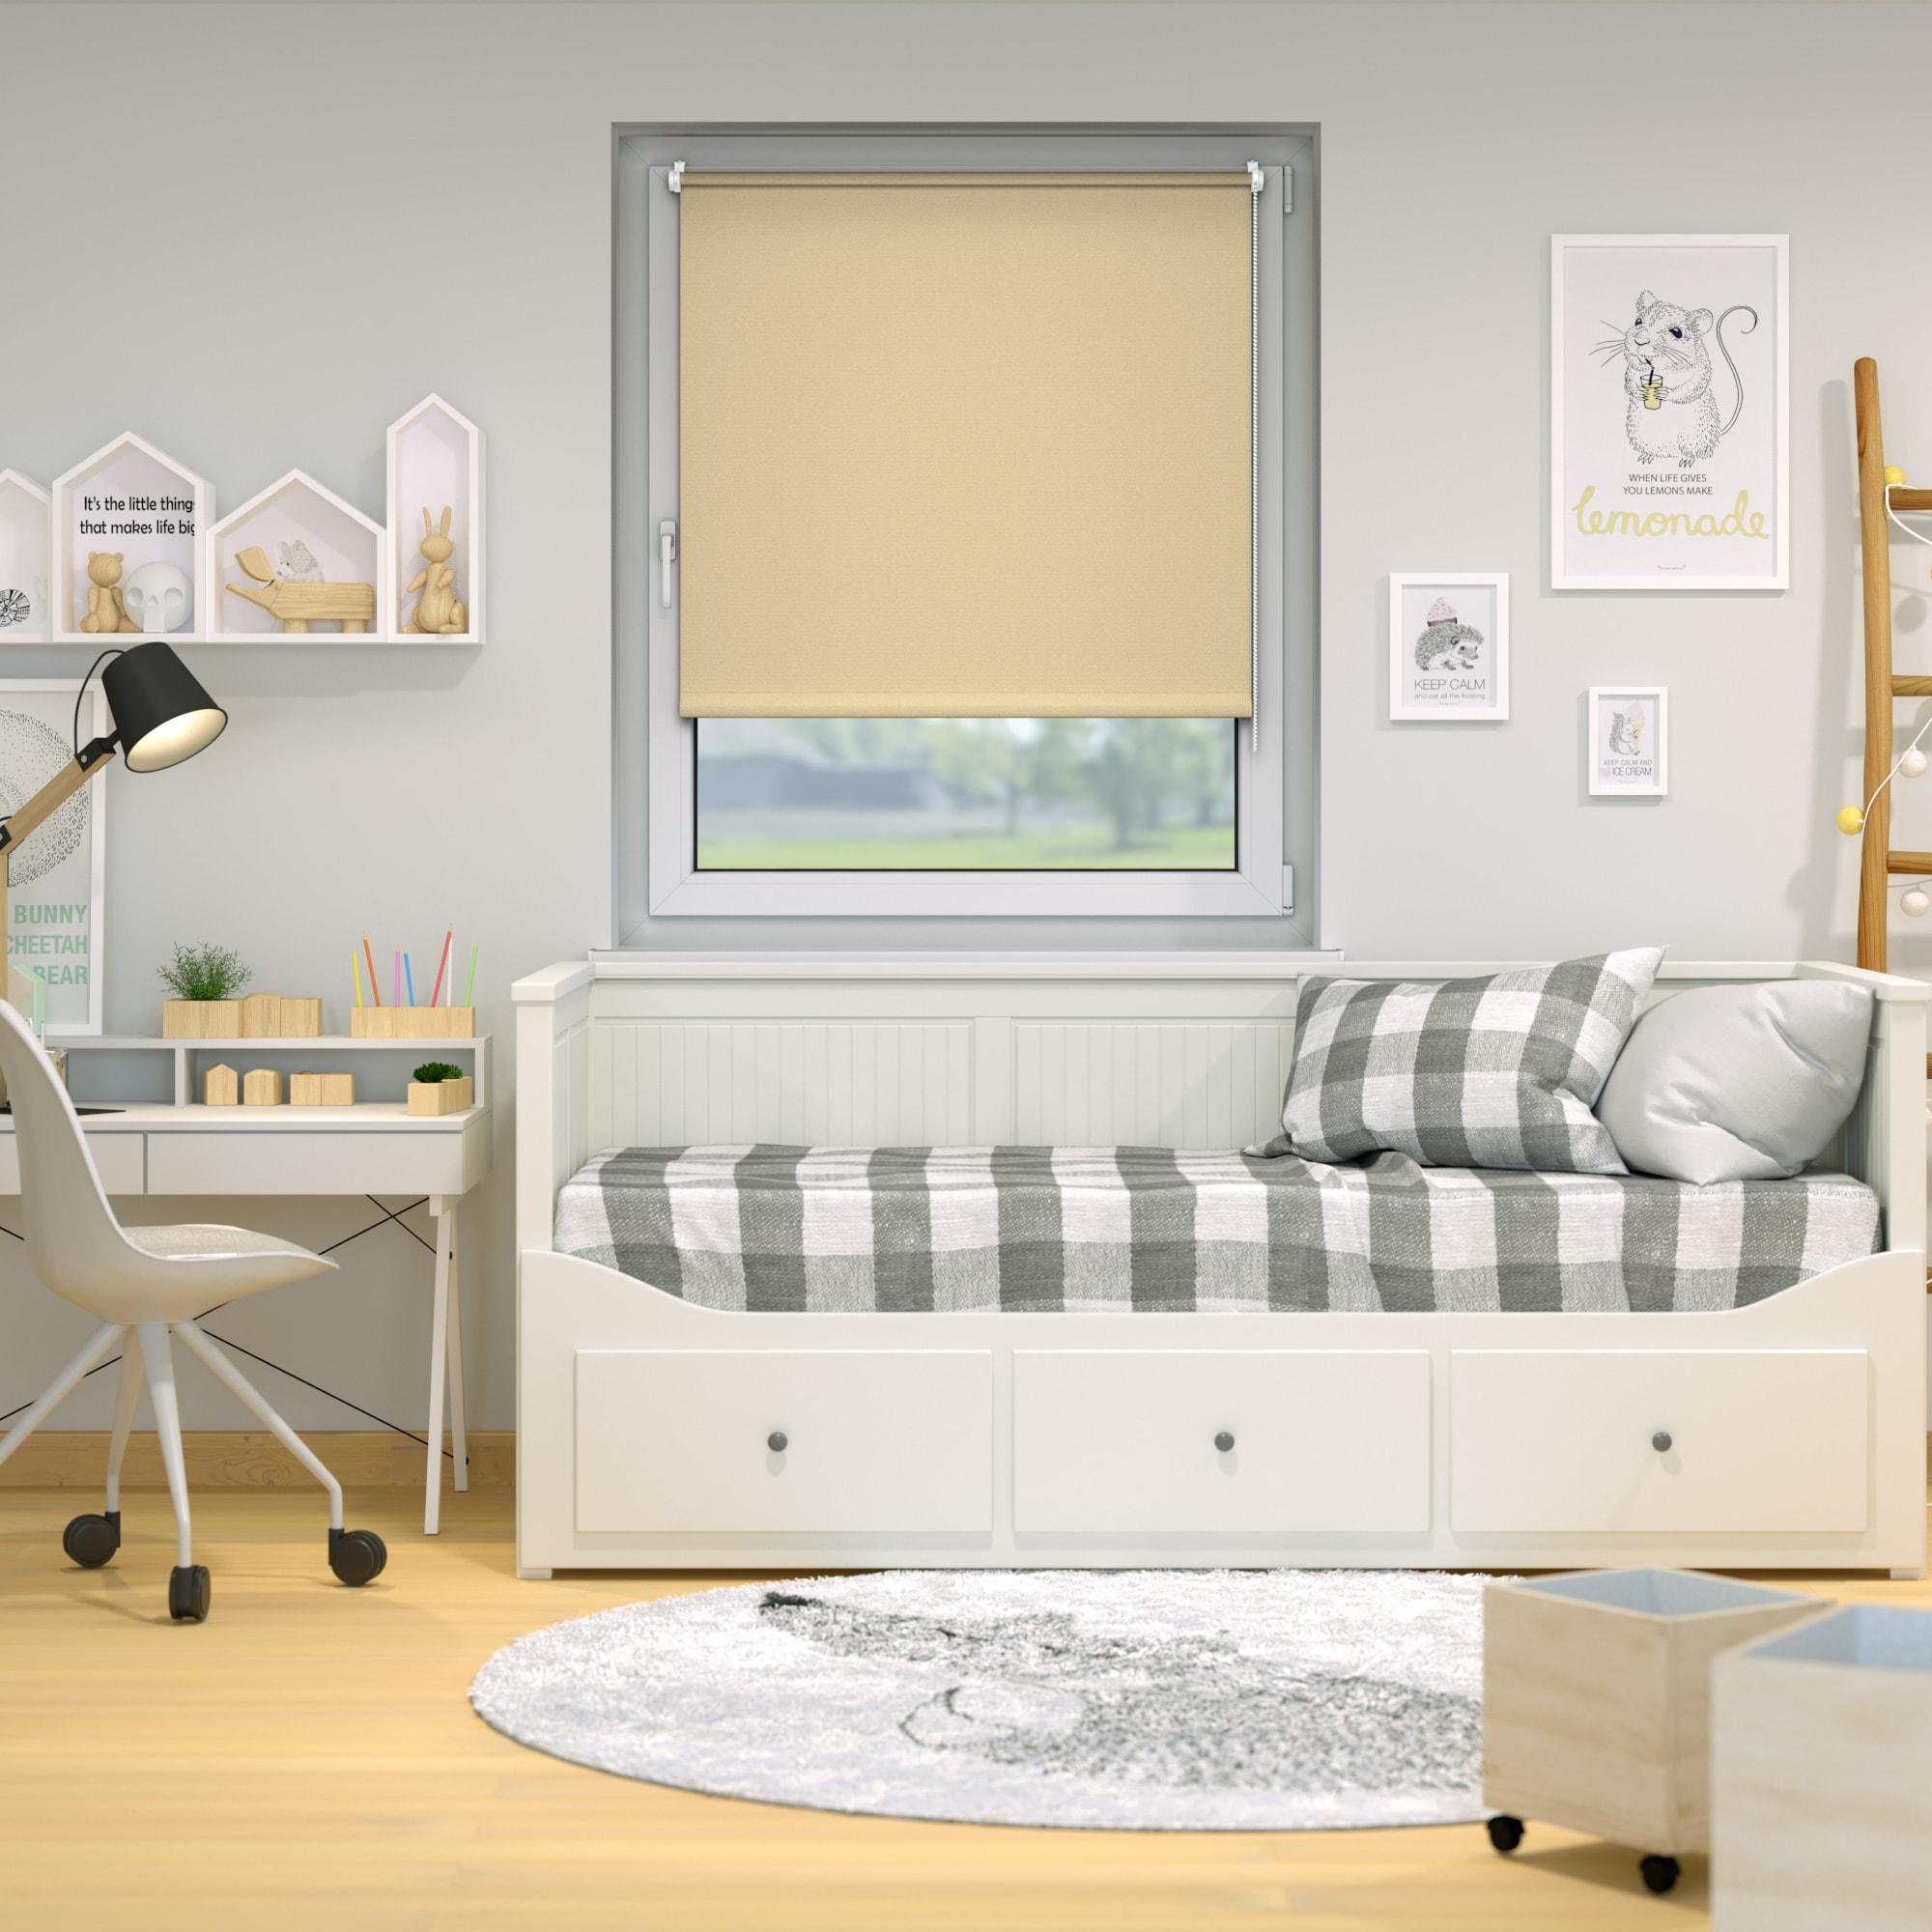 store enrouleur tenebra occultant thermique isolant. Black Bedroom Furniture Sets. Home Design Ideas